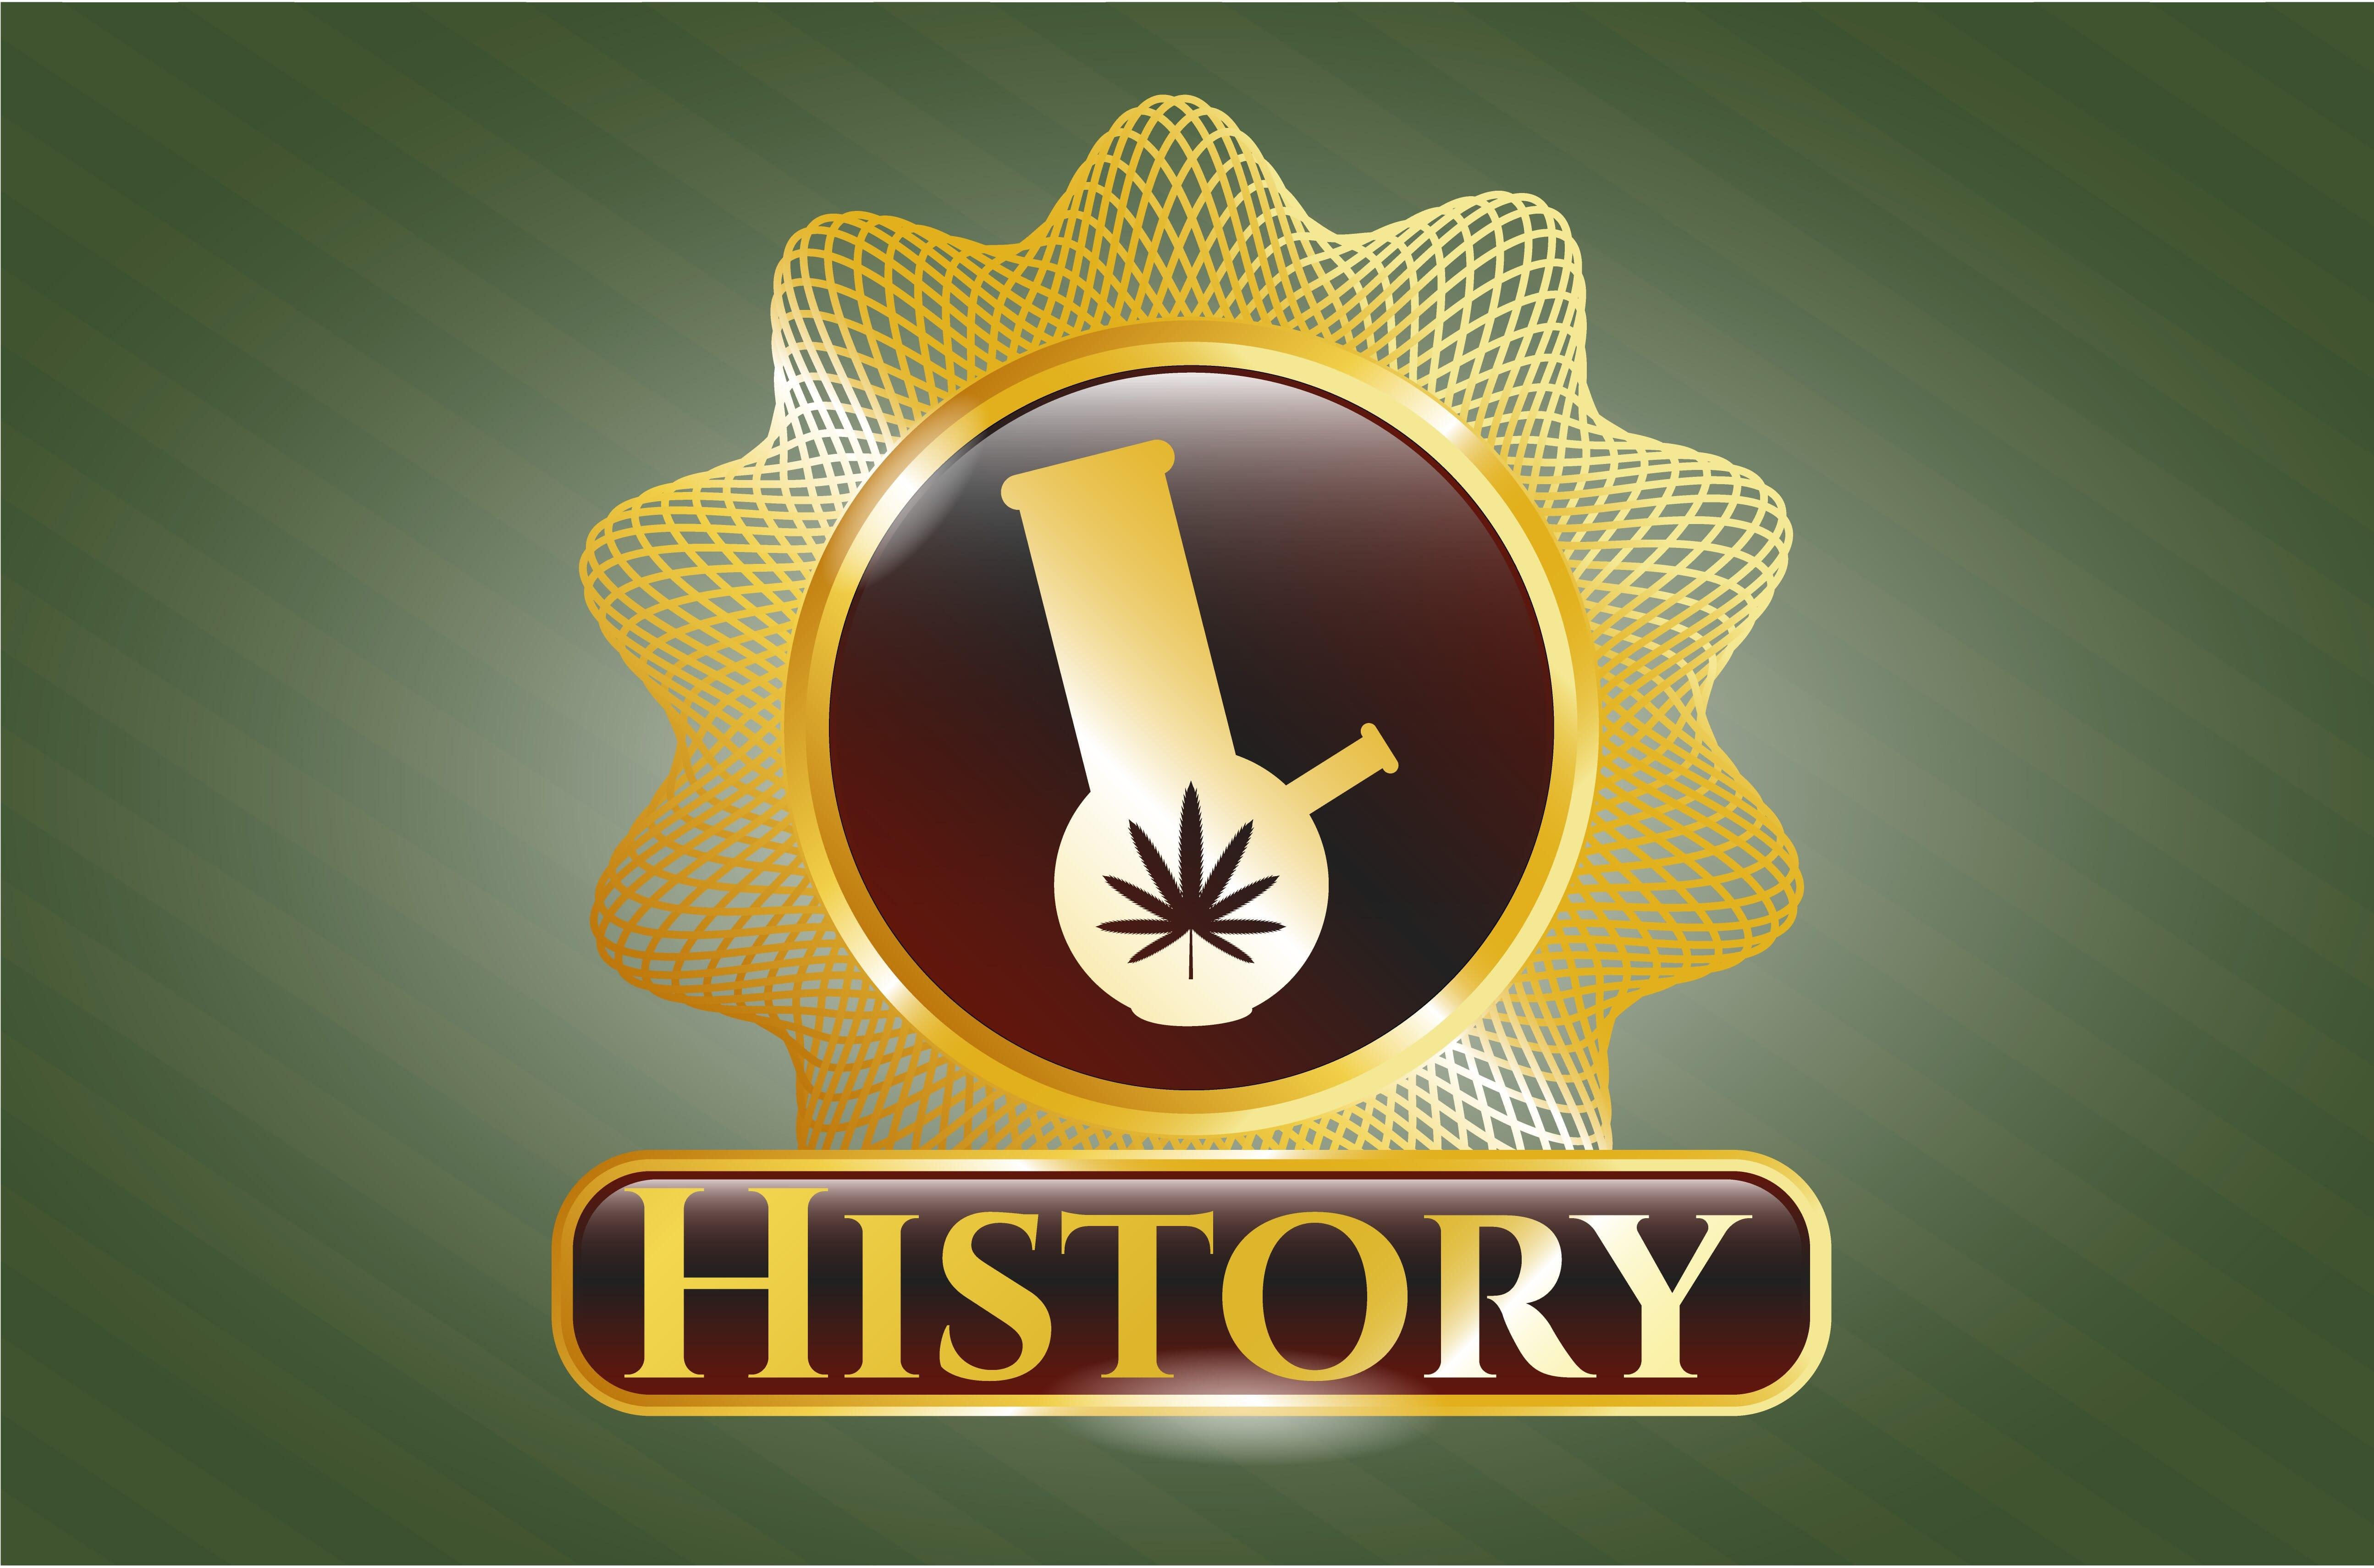 cannabis history sign